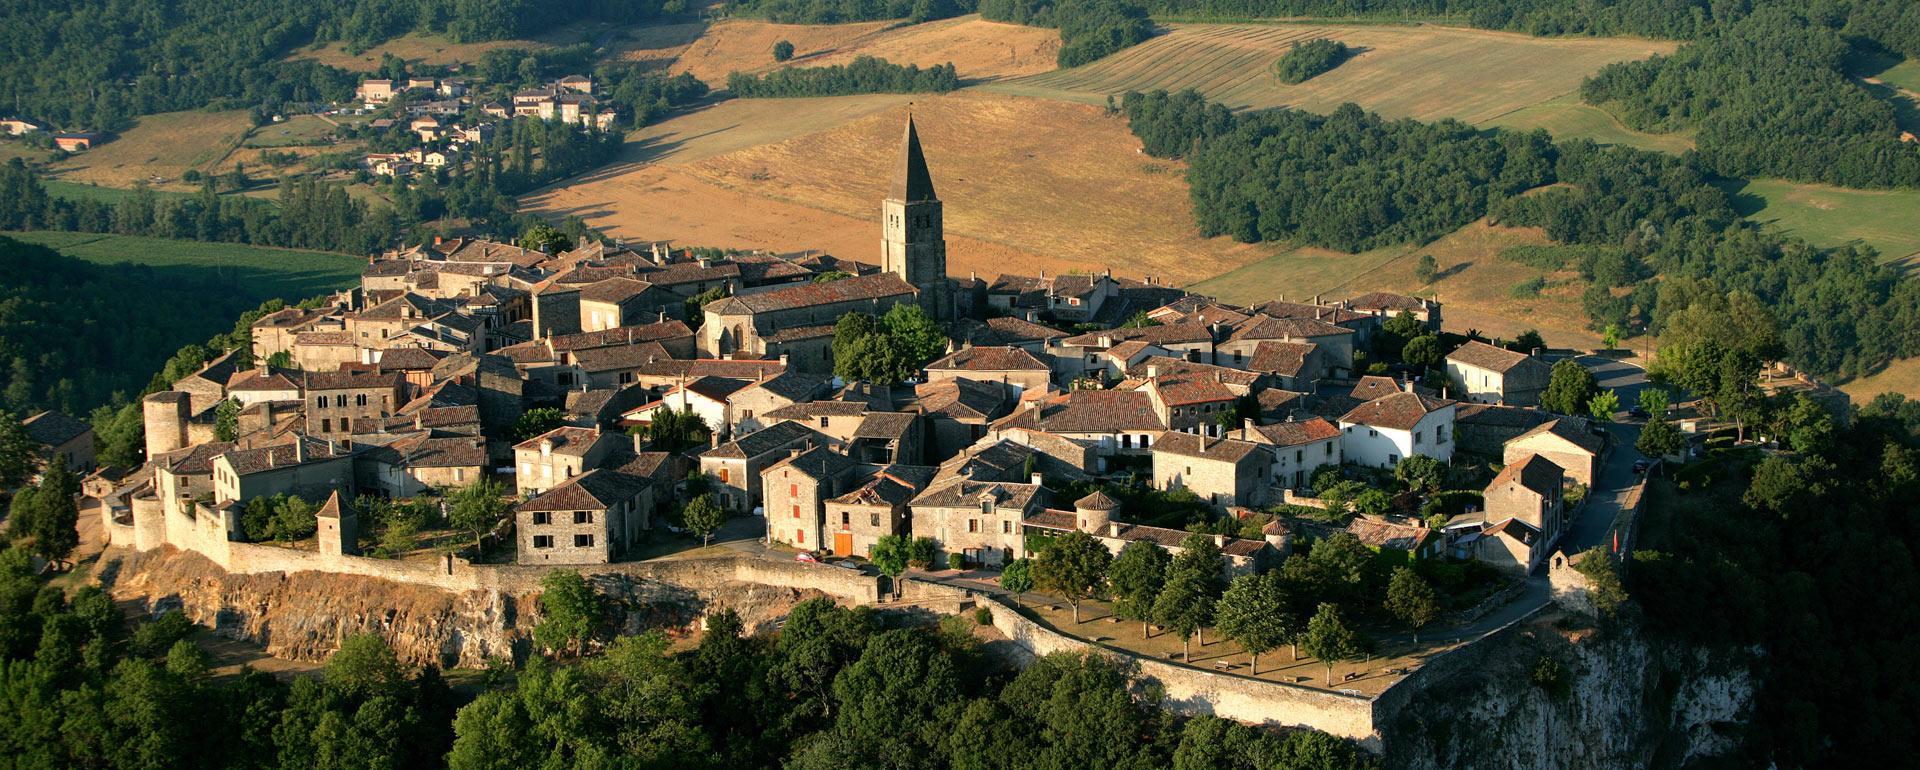 Puycelsi (Tarn)